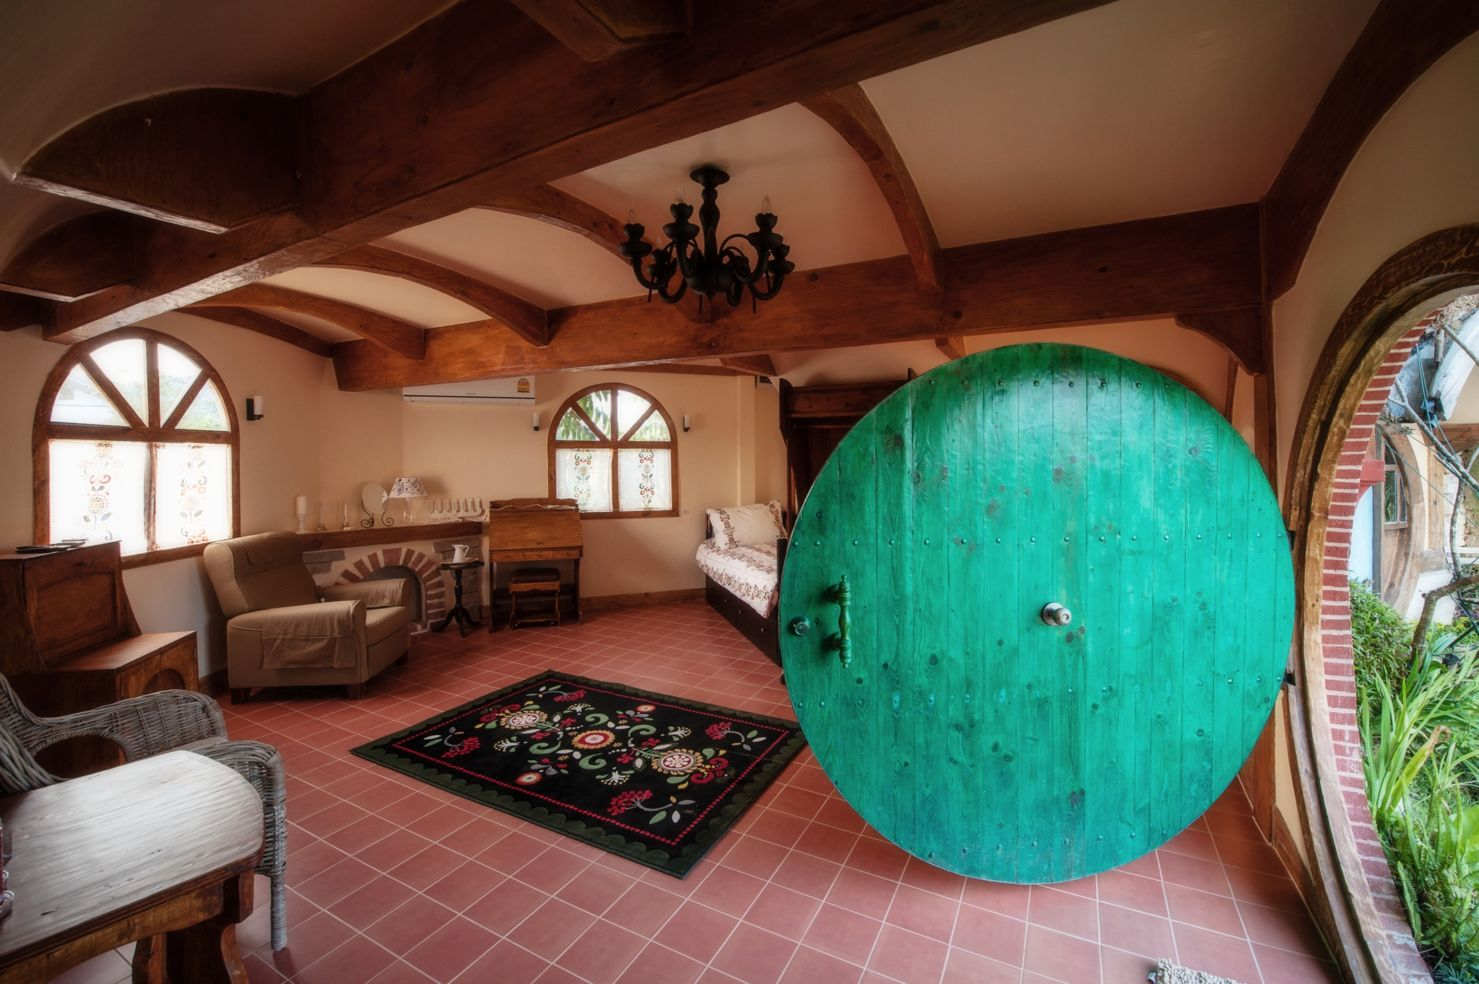 Captivating Michigan Hobbit House Hobbit House Thailand Inside ...